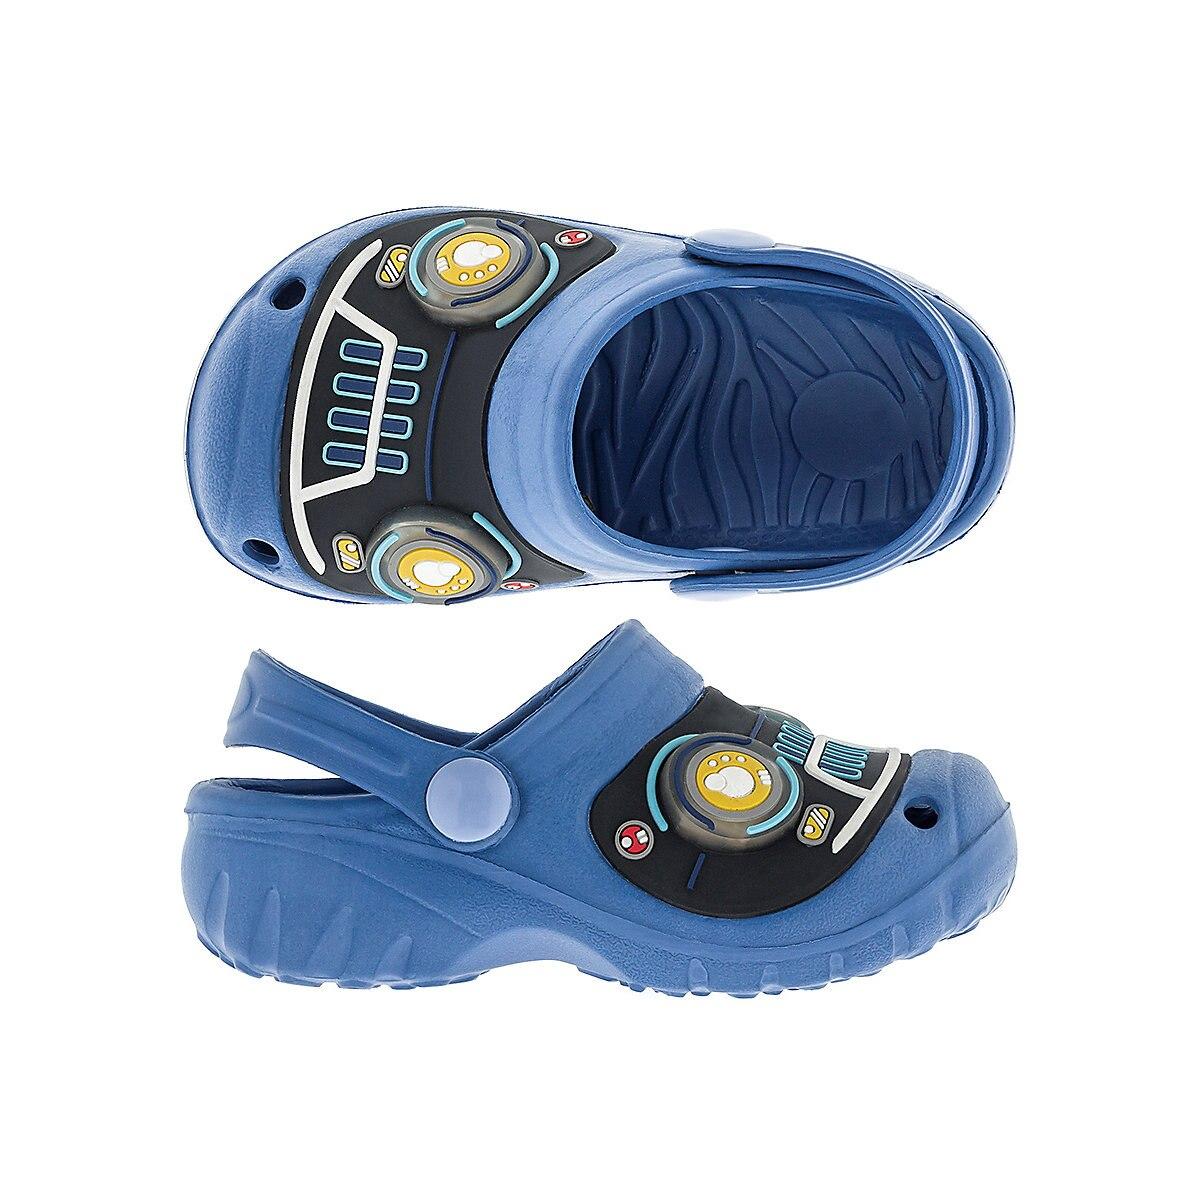 KAKADU Sandals 10696135 clogs comfortable and light children's shoes girls and boys gktinoo summer genuine leather women sandals comfortable ladies shoes gladiator sandal women female flat sandals fashion shoe